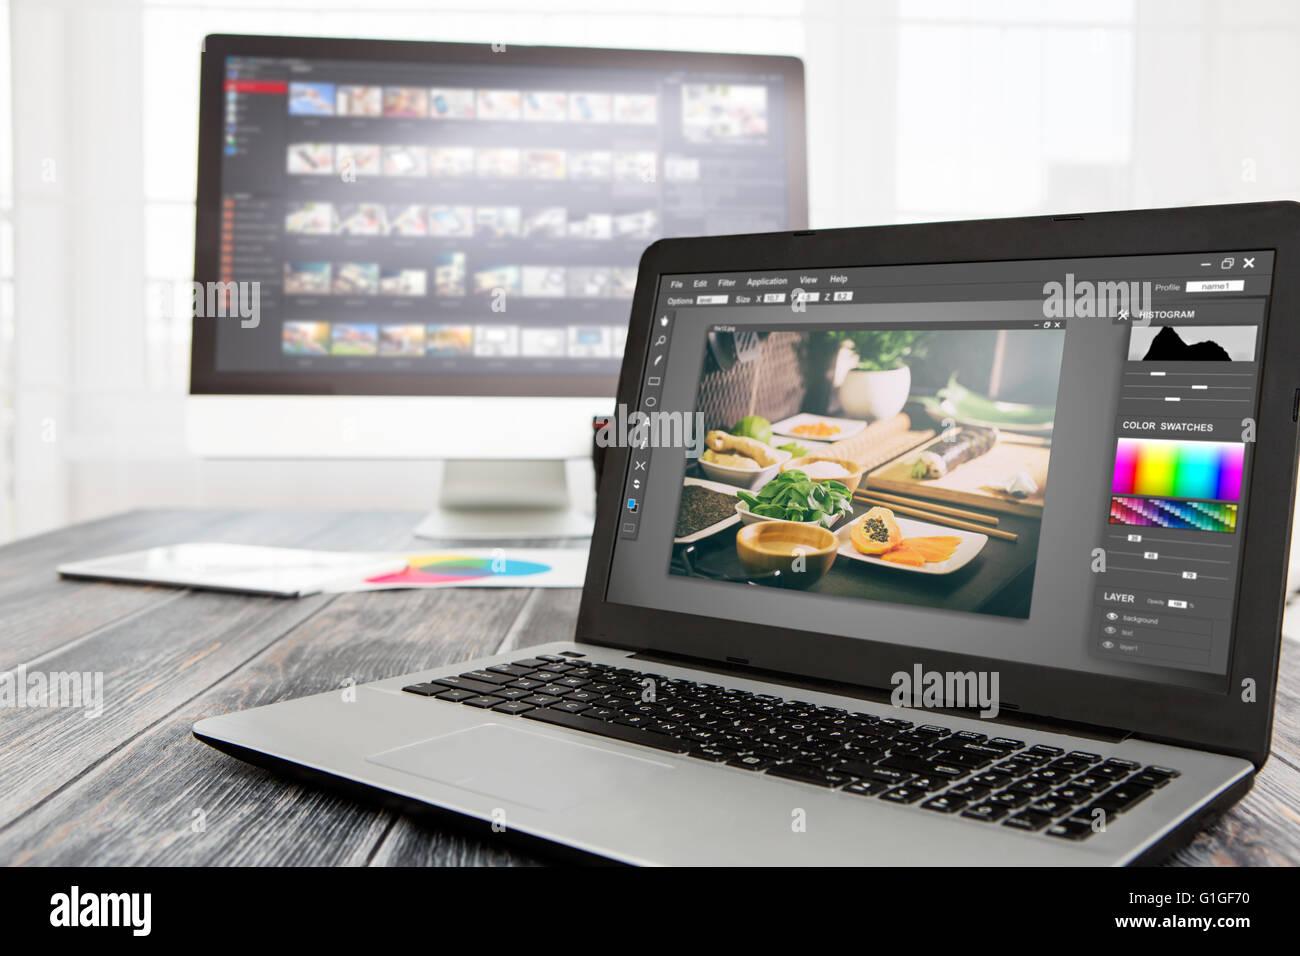 Fotograf Kamera Editor Monitor Design Laptop Foto Bildschirm Fotografie - Bild Stockbild